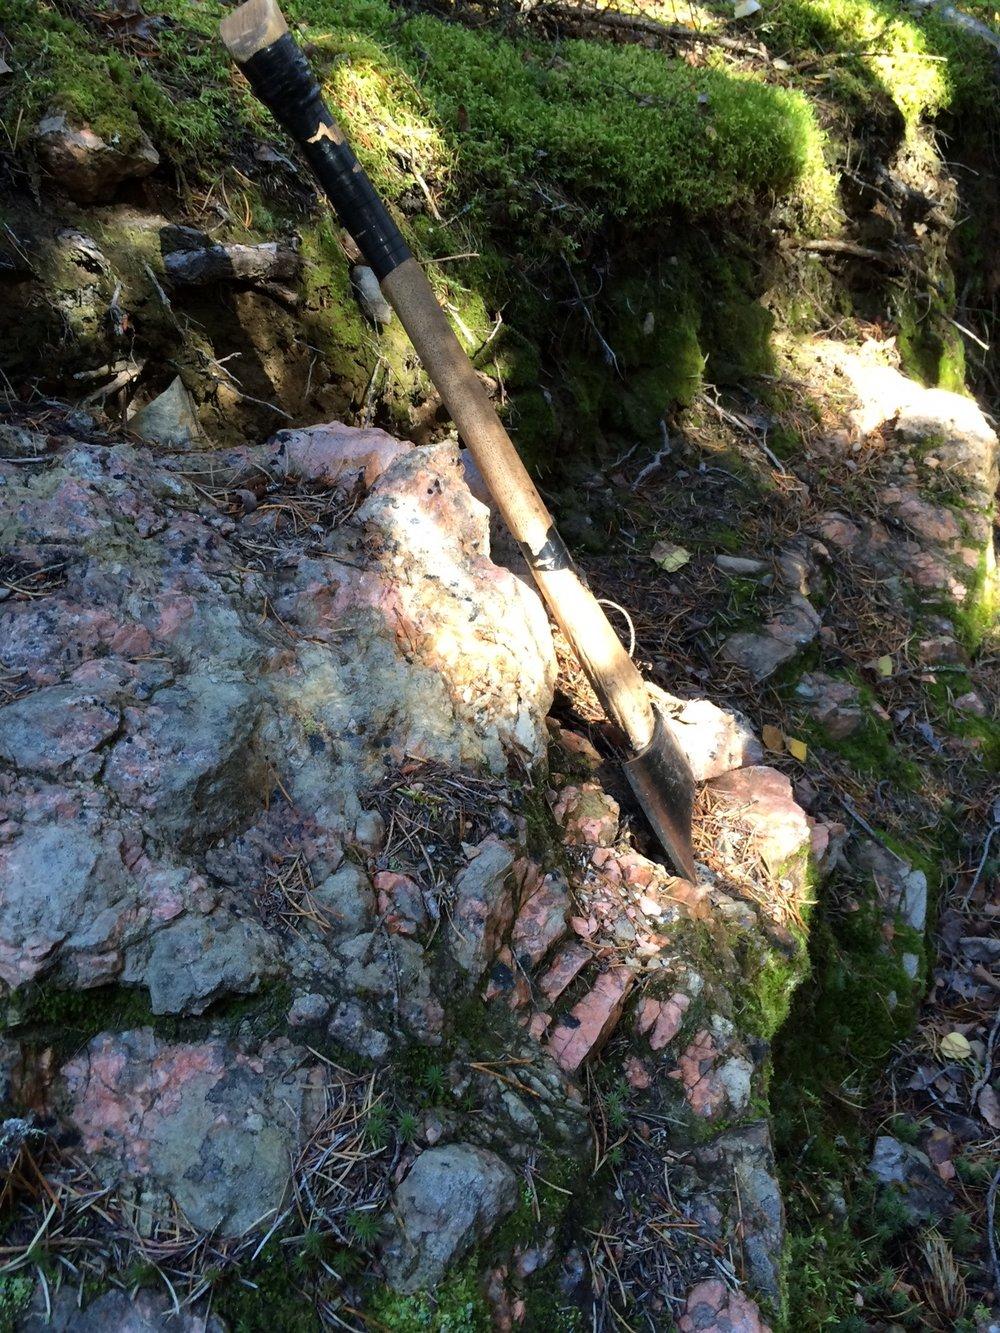 Outcrop of spodumene-bearing Zoro pegmatite Dyke 1.